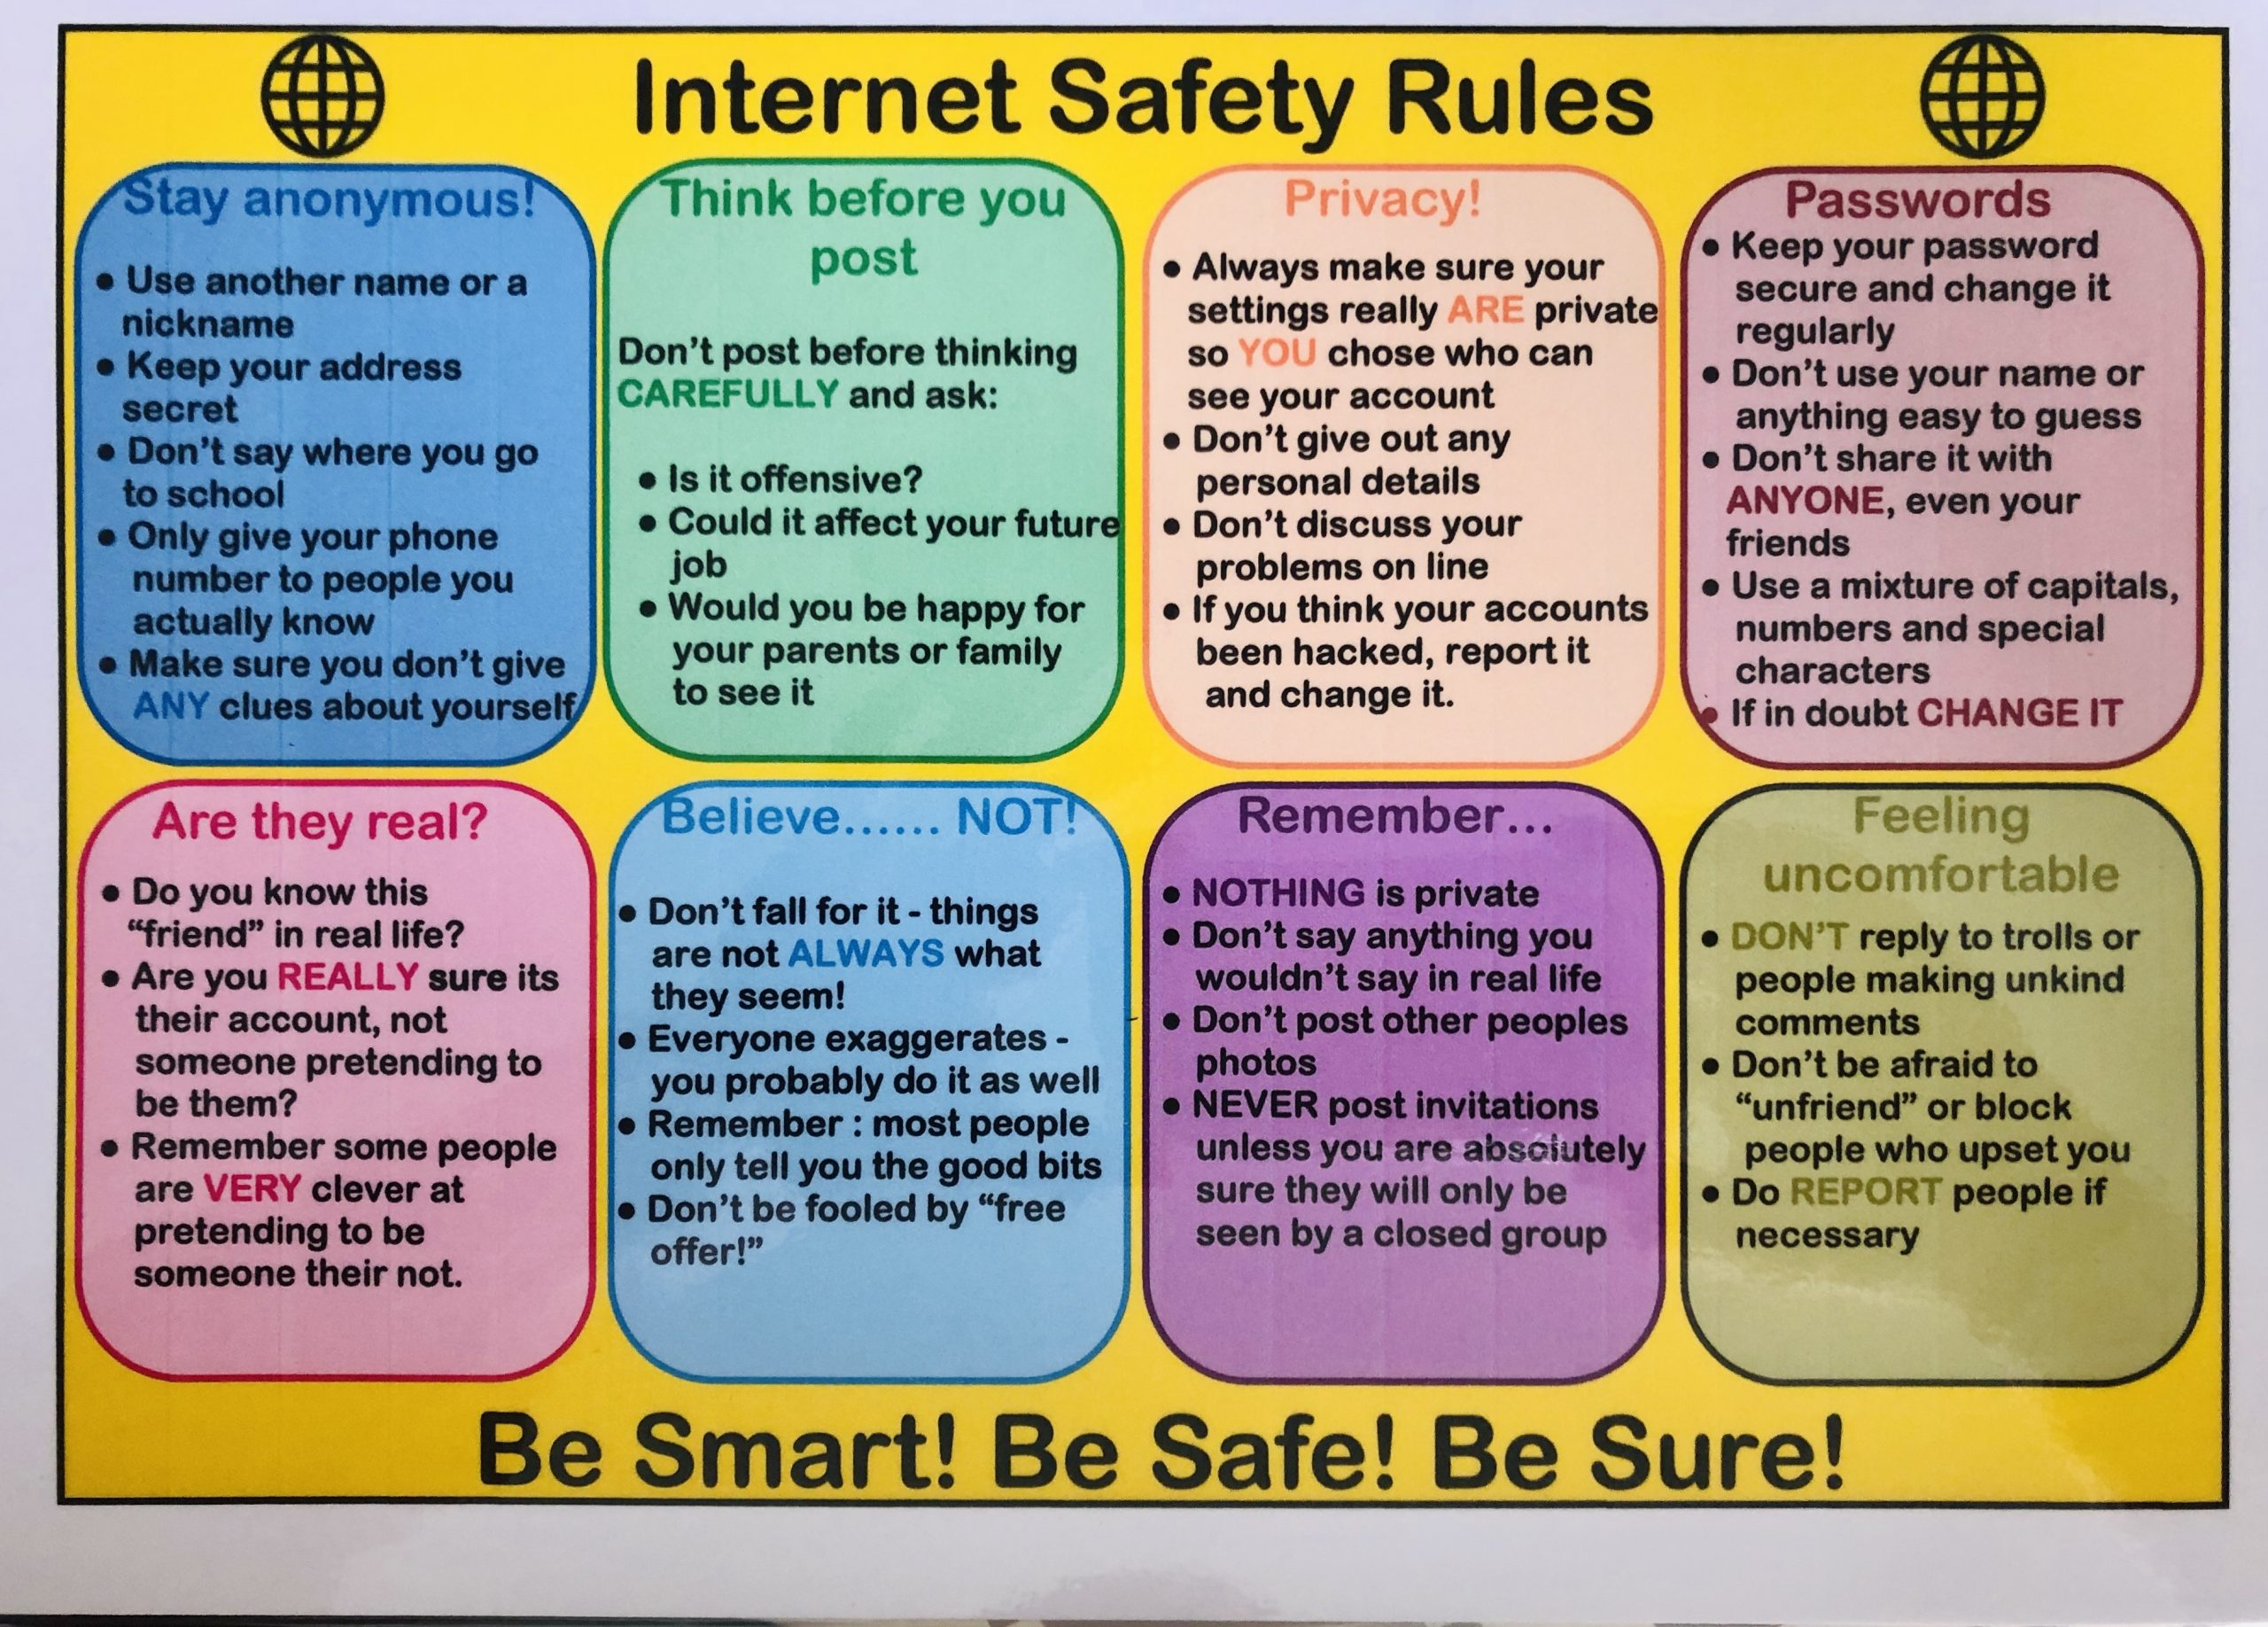 Internet Safety Rules Poster - AP Cymru